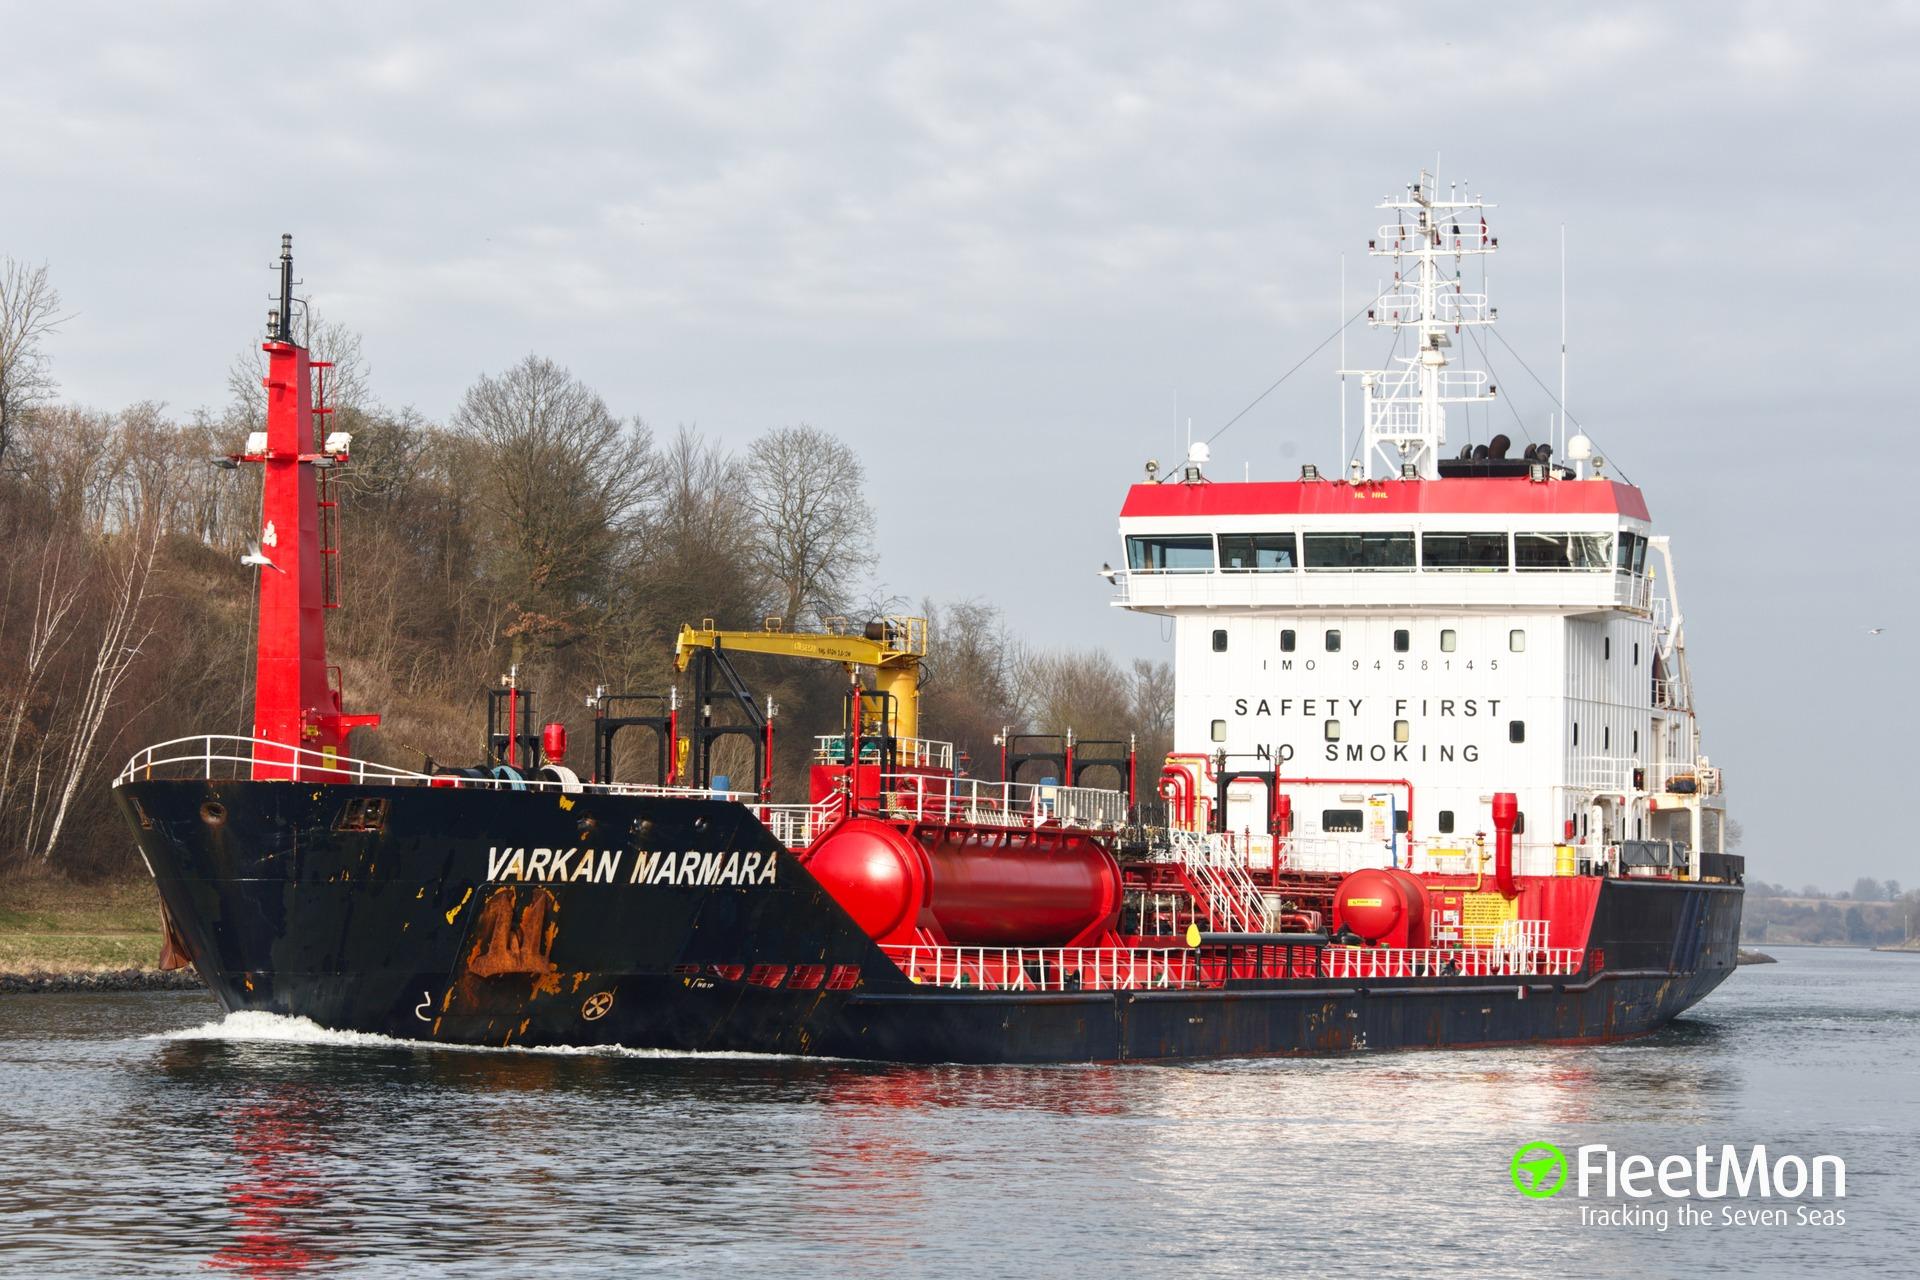 Chemical tanker Varkan Marmara experienced engine problem, Med